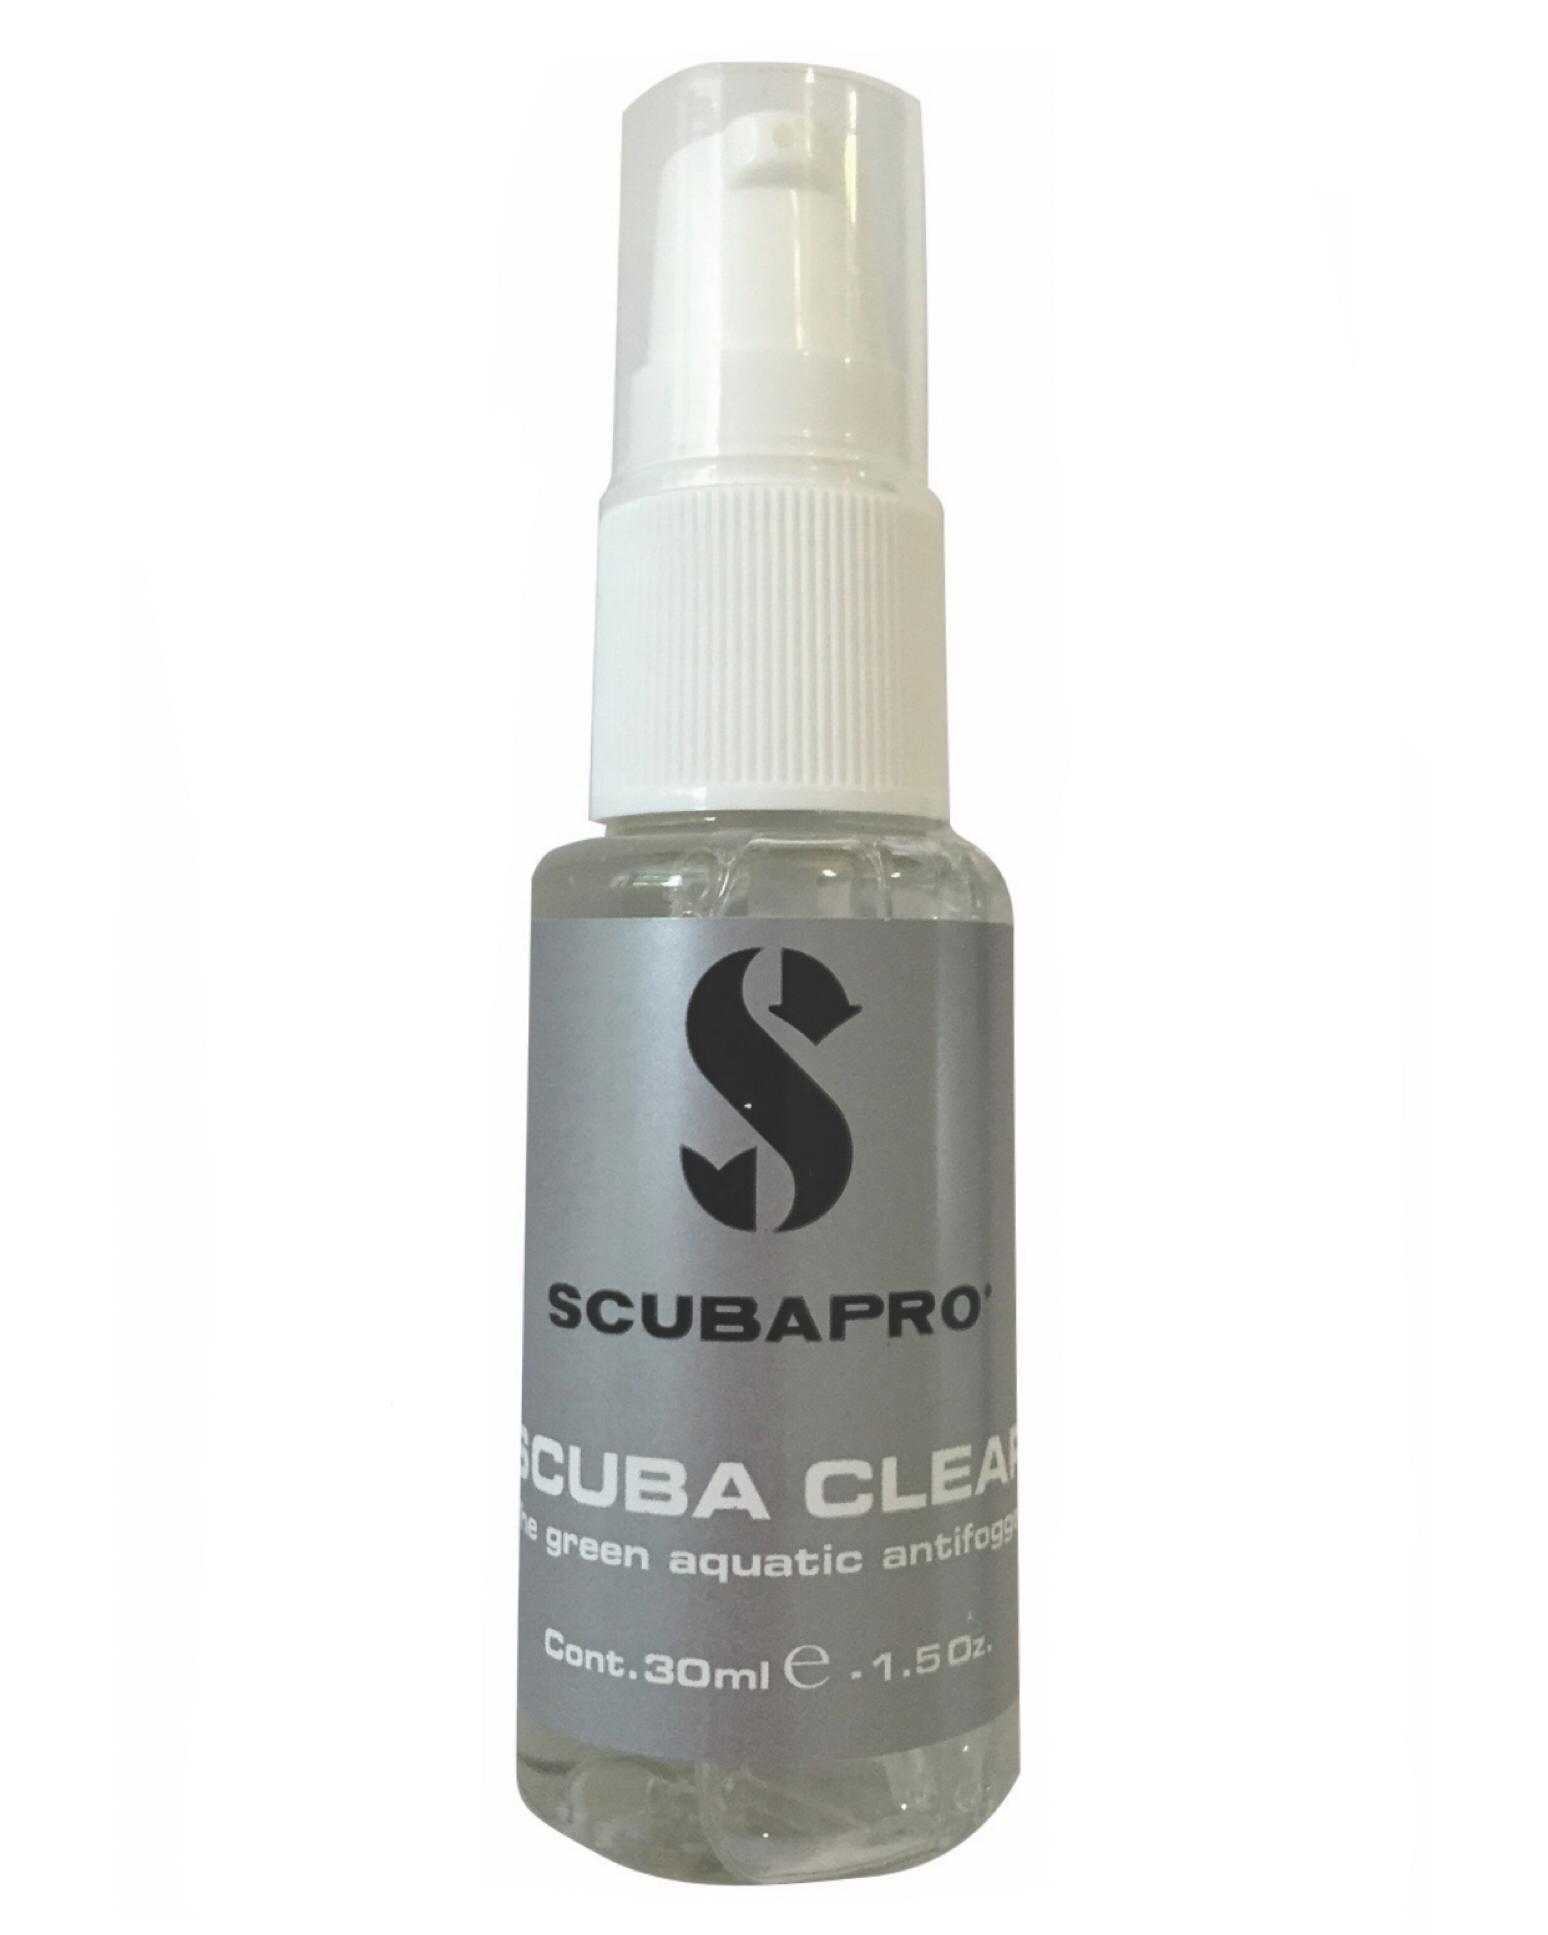 Scubaclear65